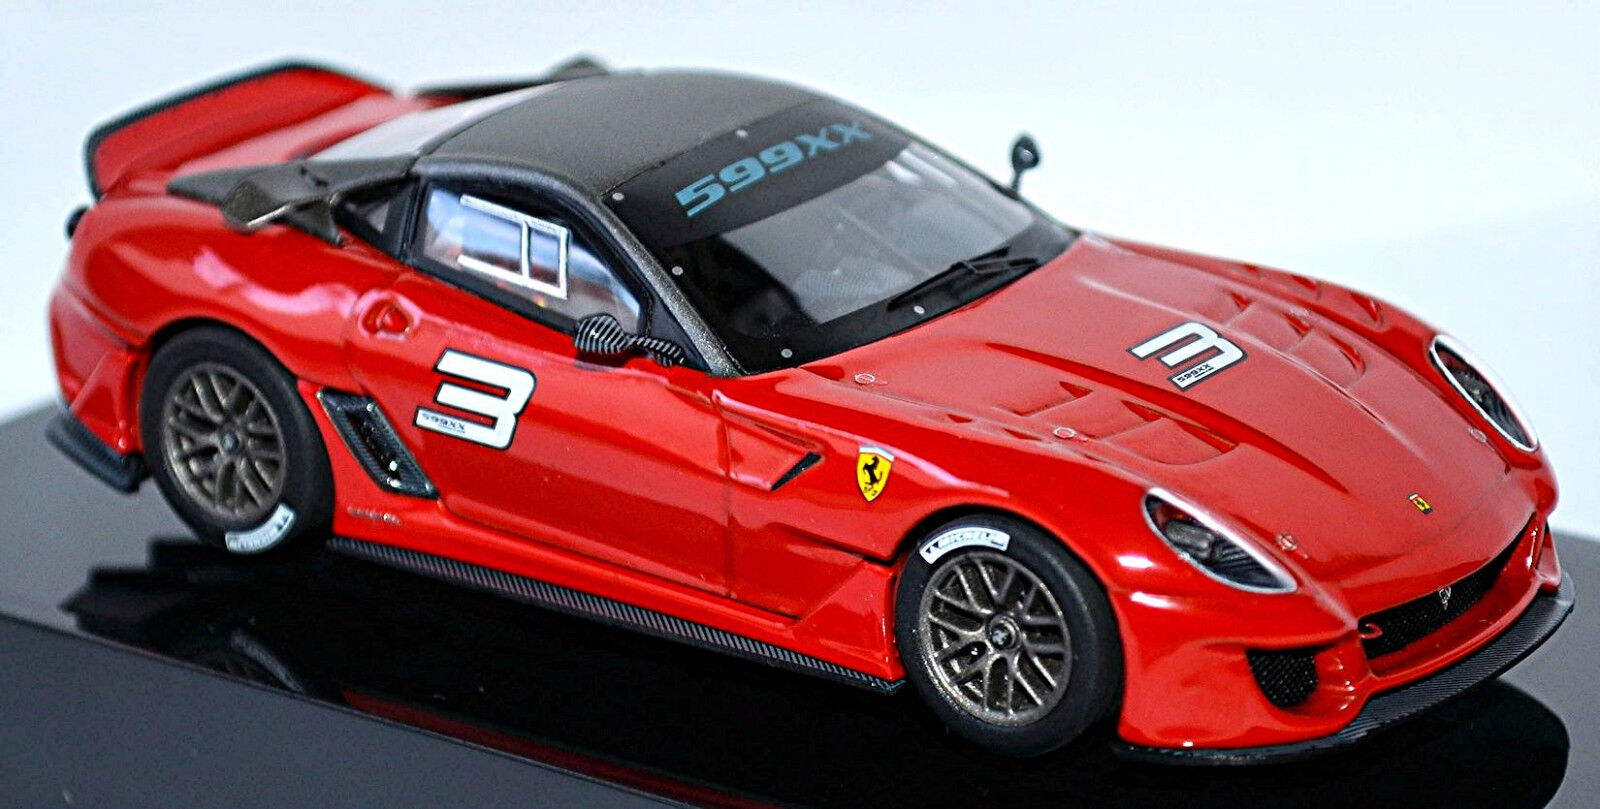 Ferrari 599XX Coupé 2009  3 Rojo rojo 1 43 Hot Wheels Elite